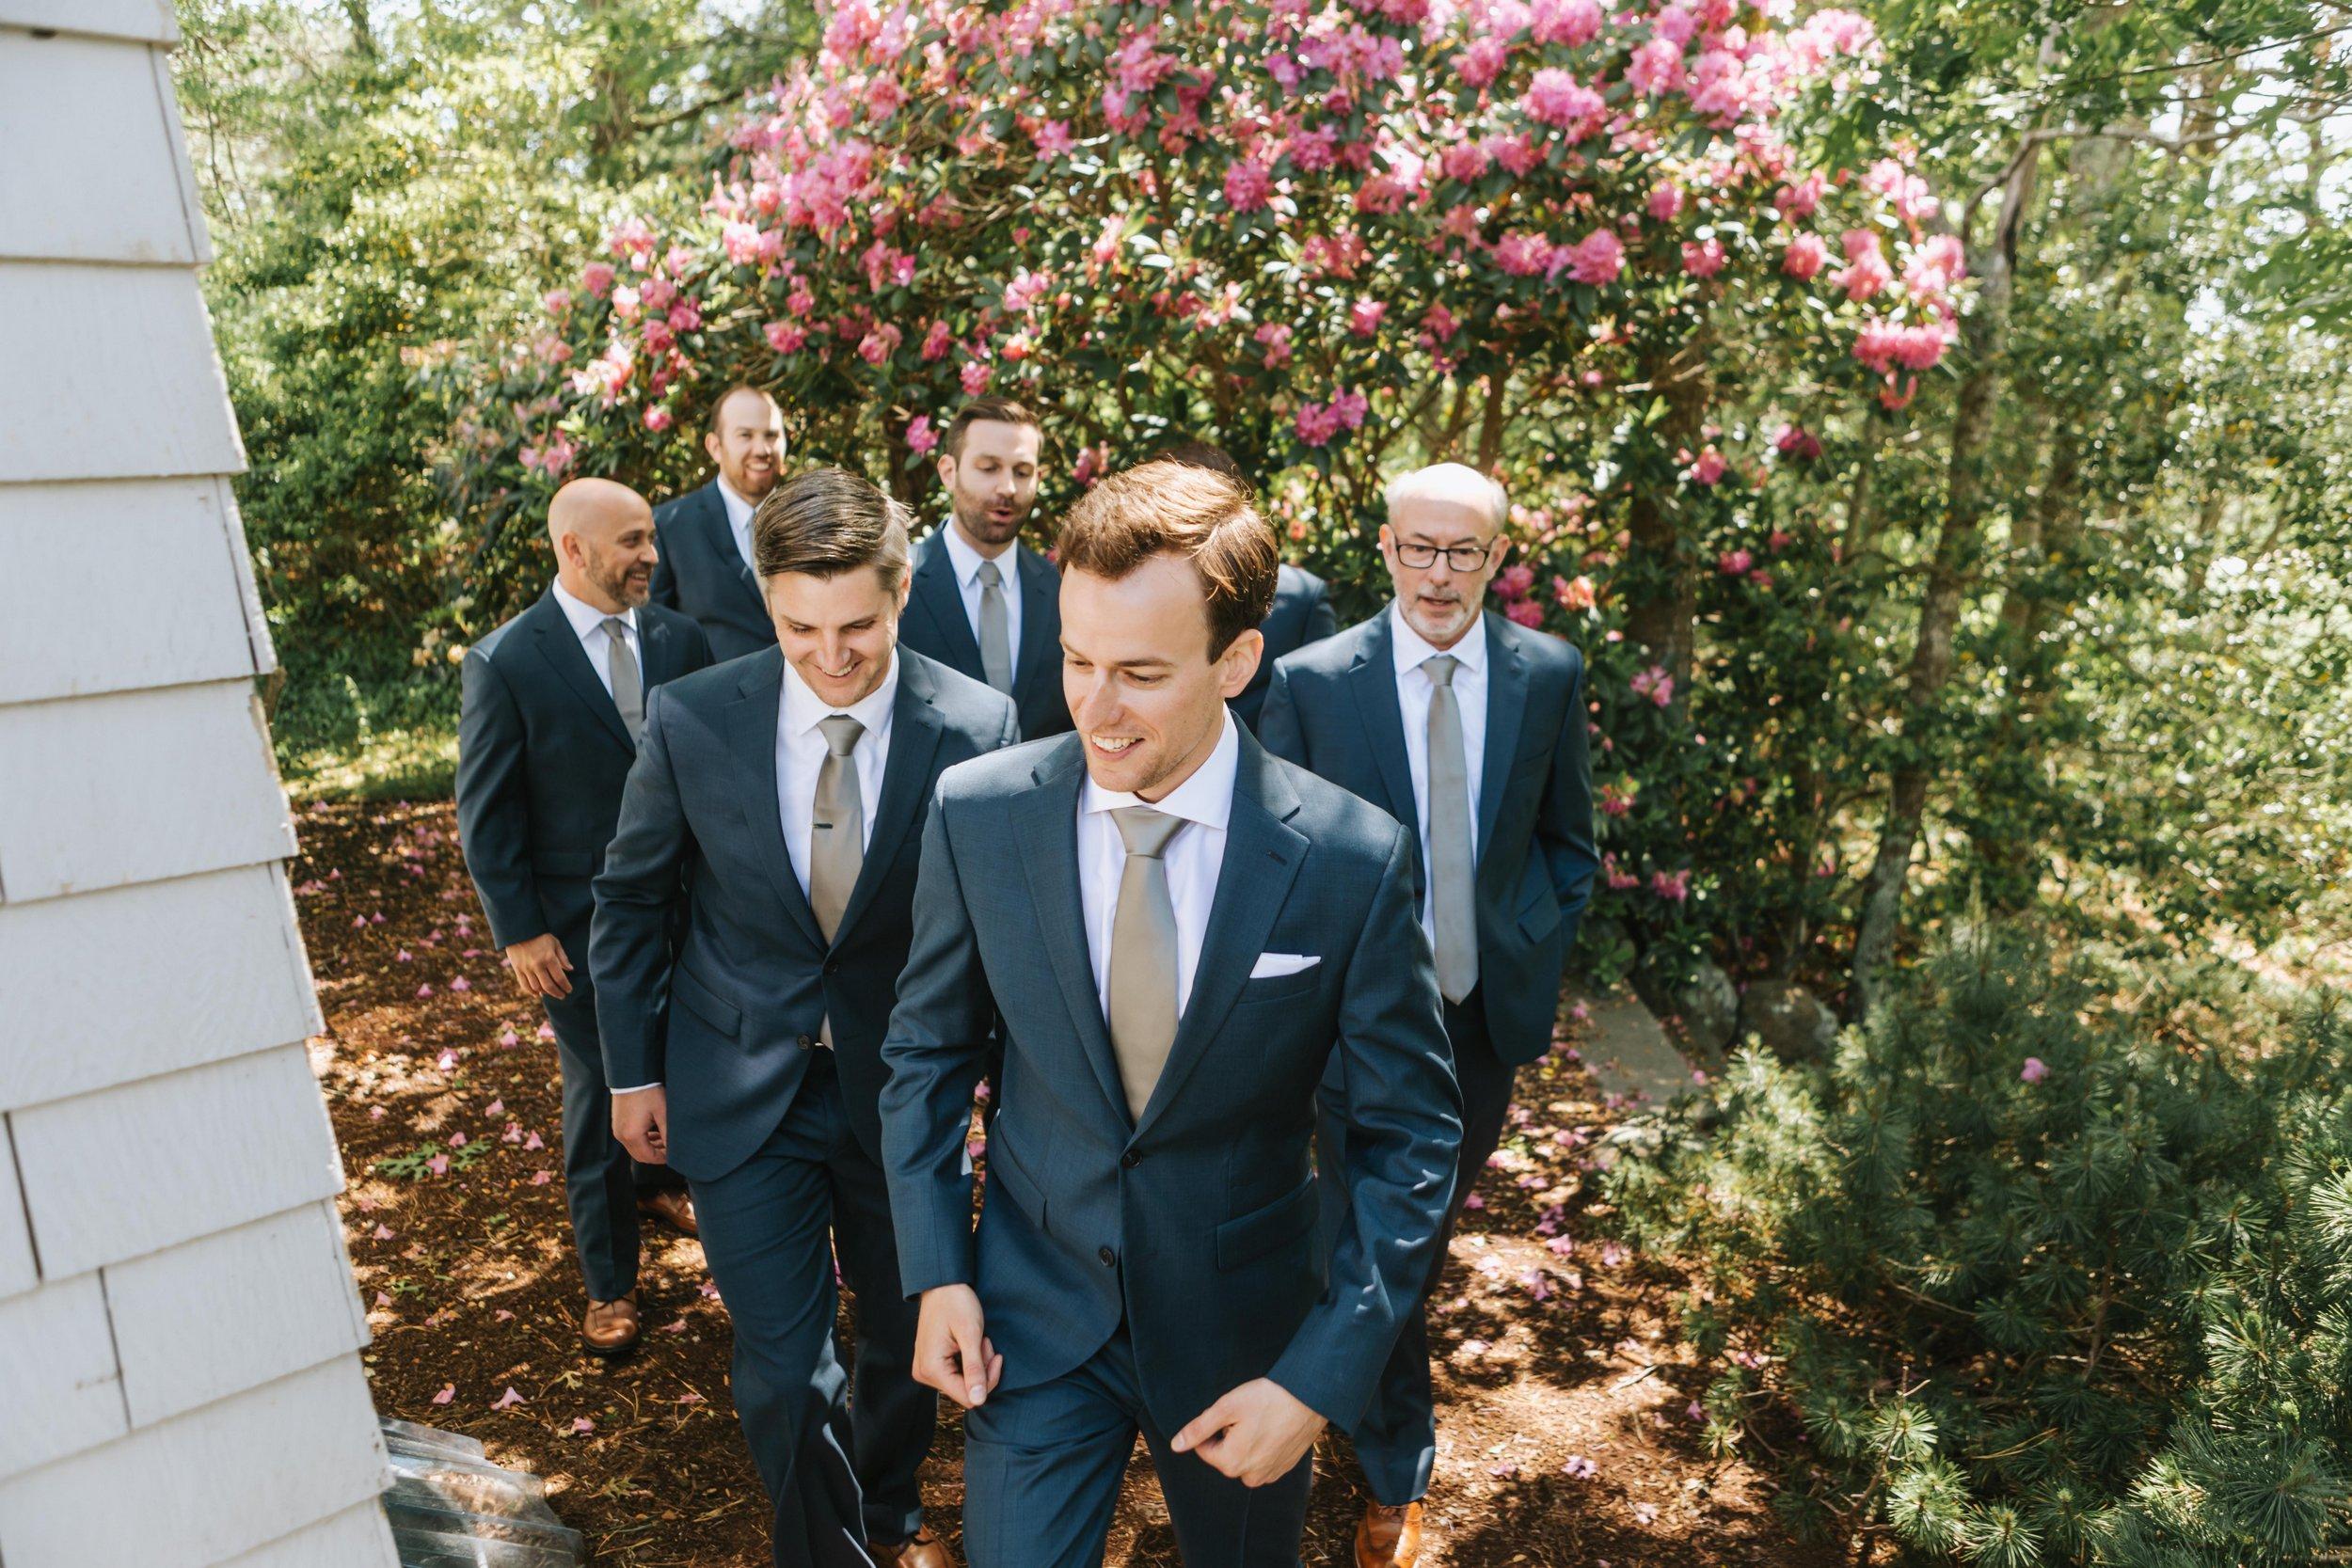 Popponesset-Inn-Wedding-Cape-Cod-Lena-Mirisola-Photography-12.jpg